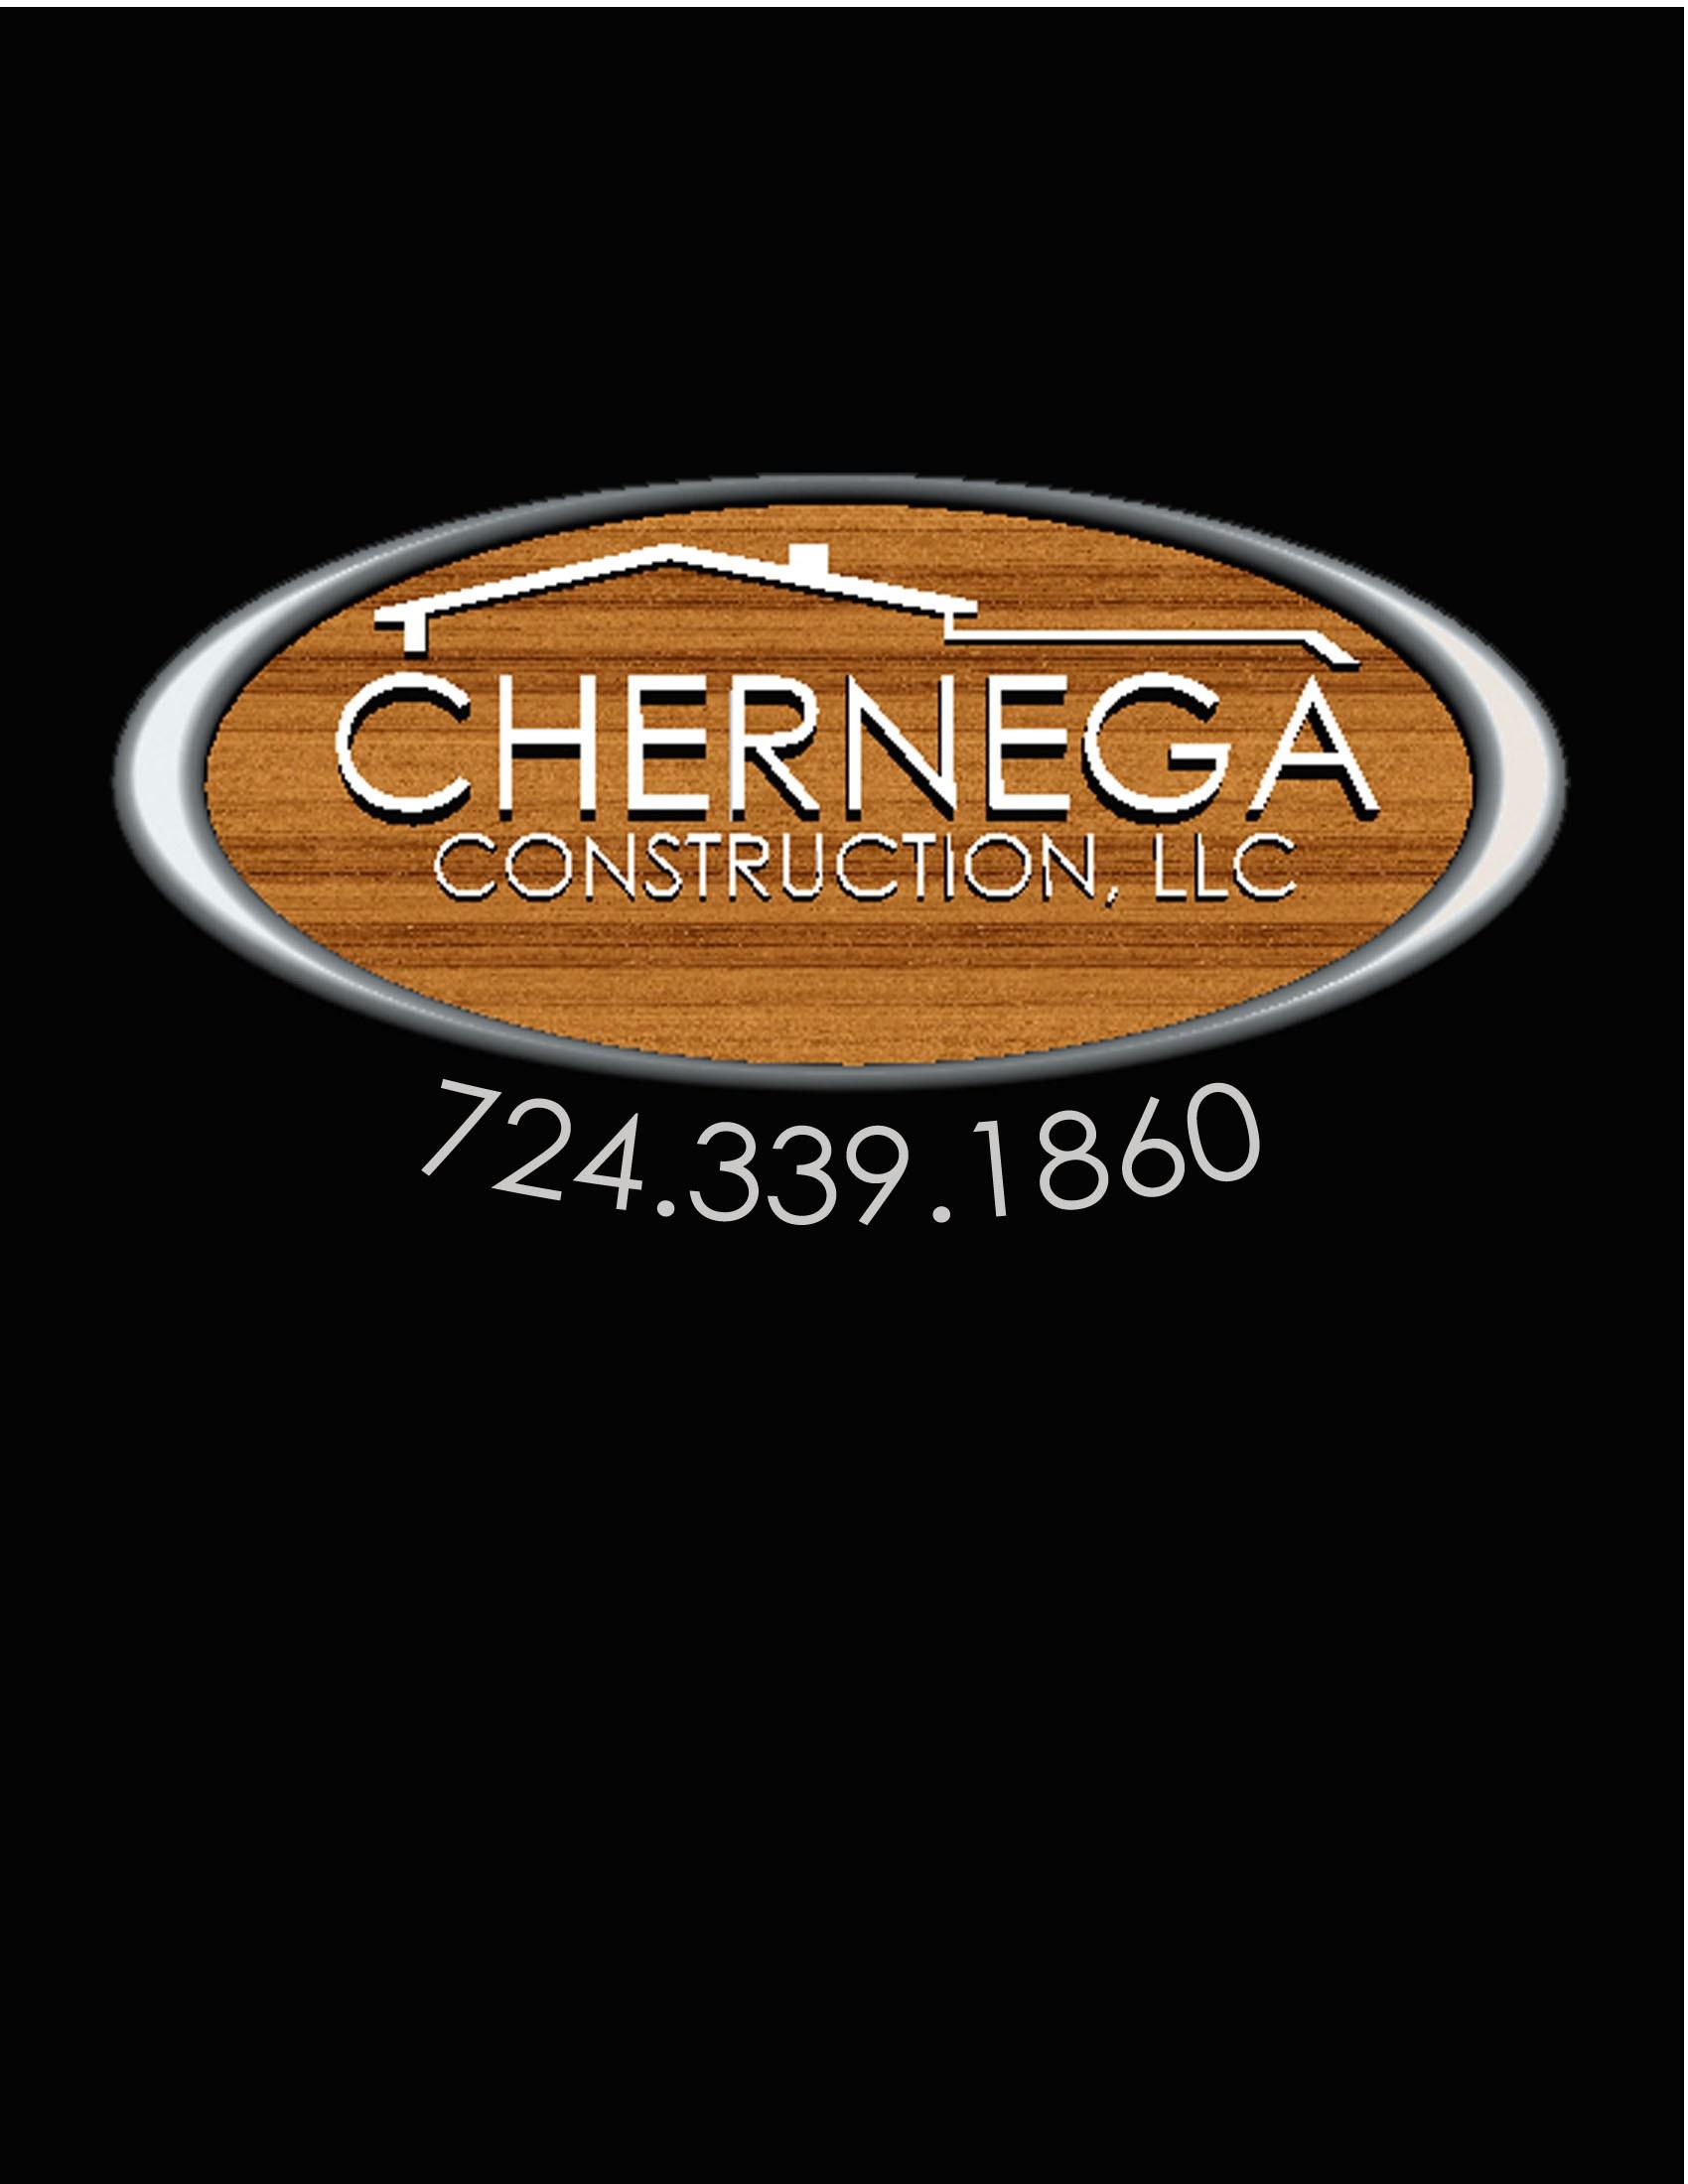 Chernega Construction LLC logo